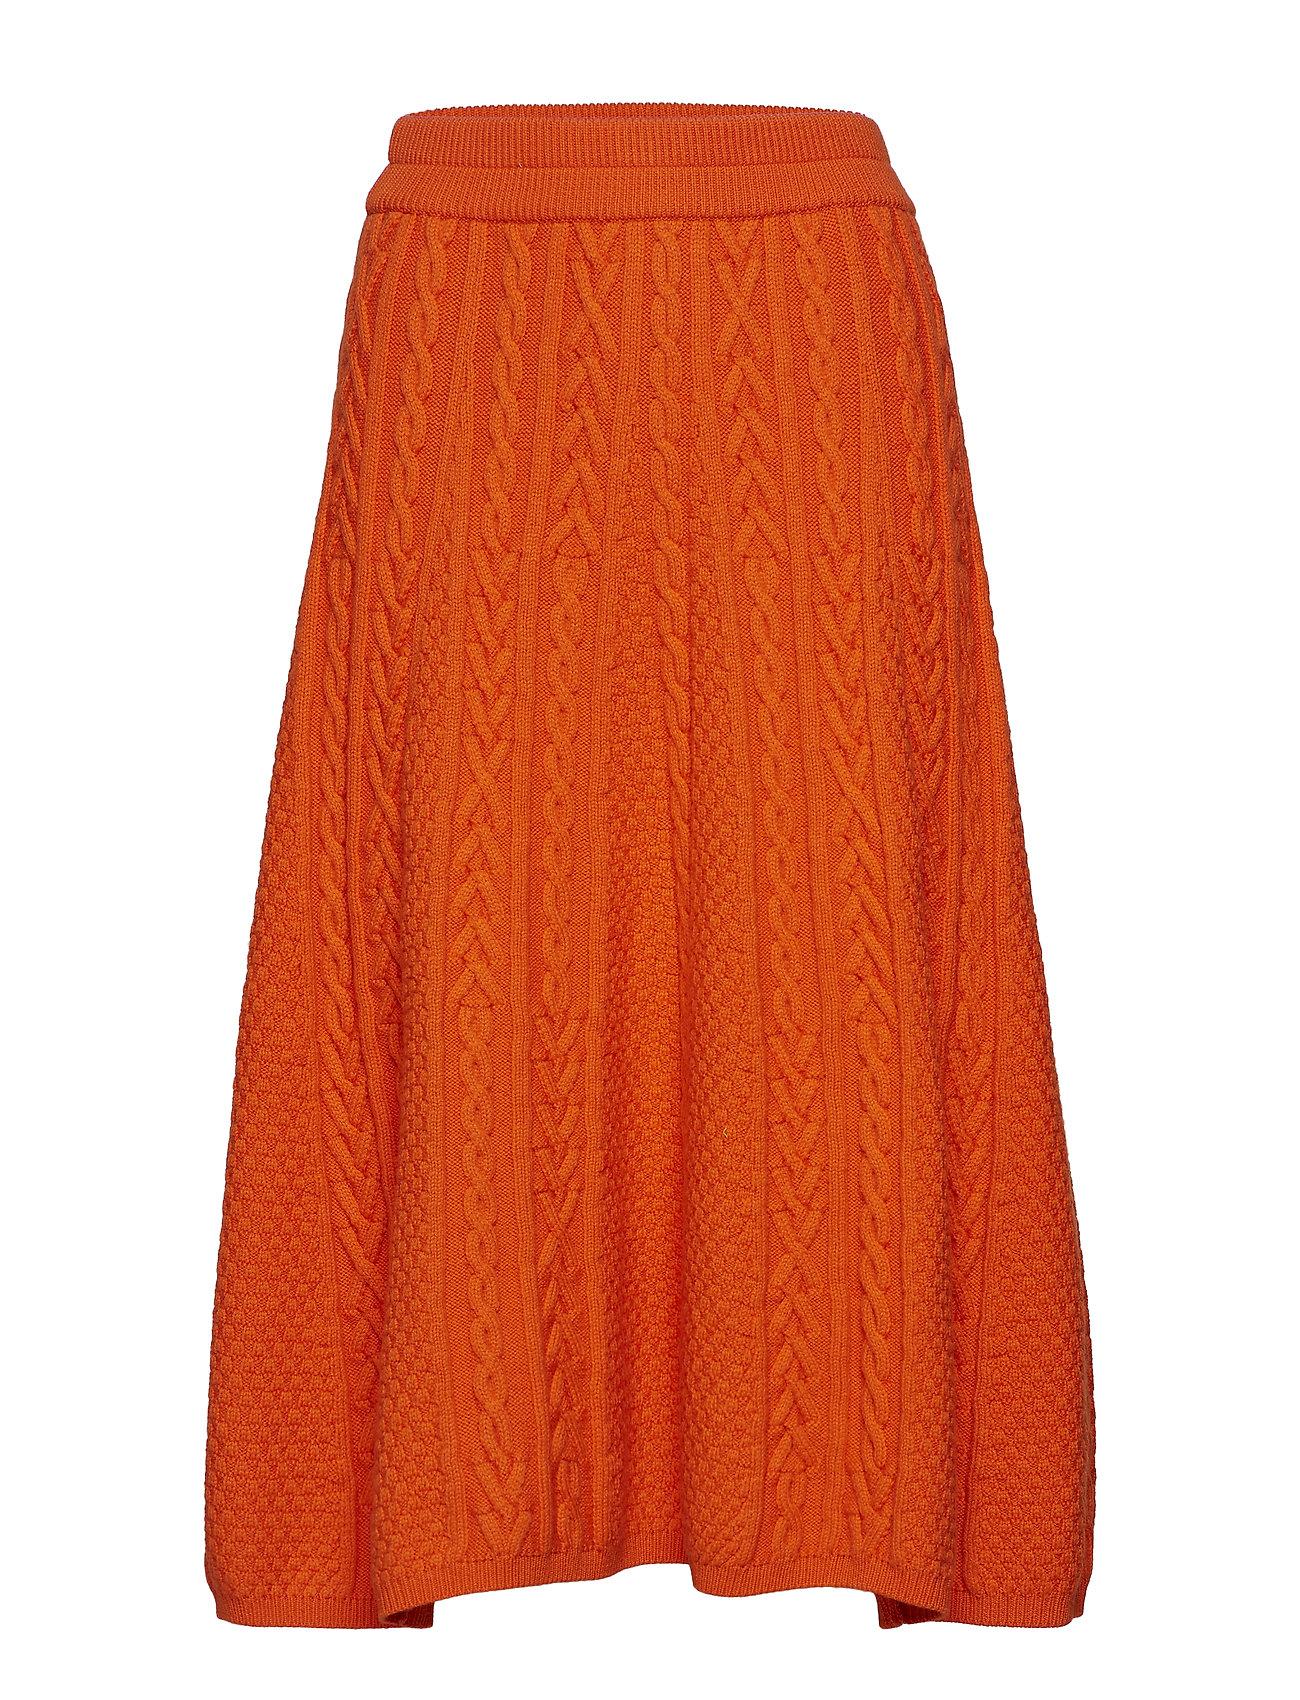 Kenzo Skirt Special - MEDIUM ORANGE